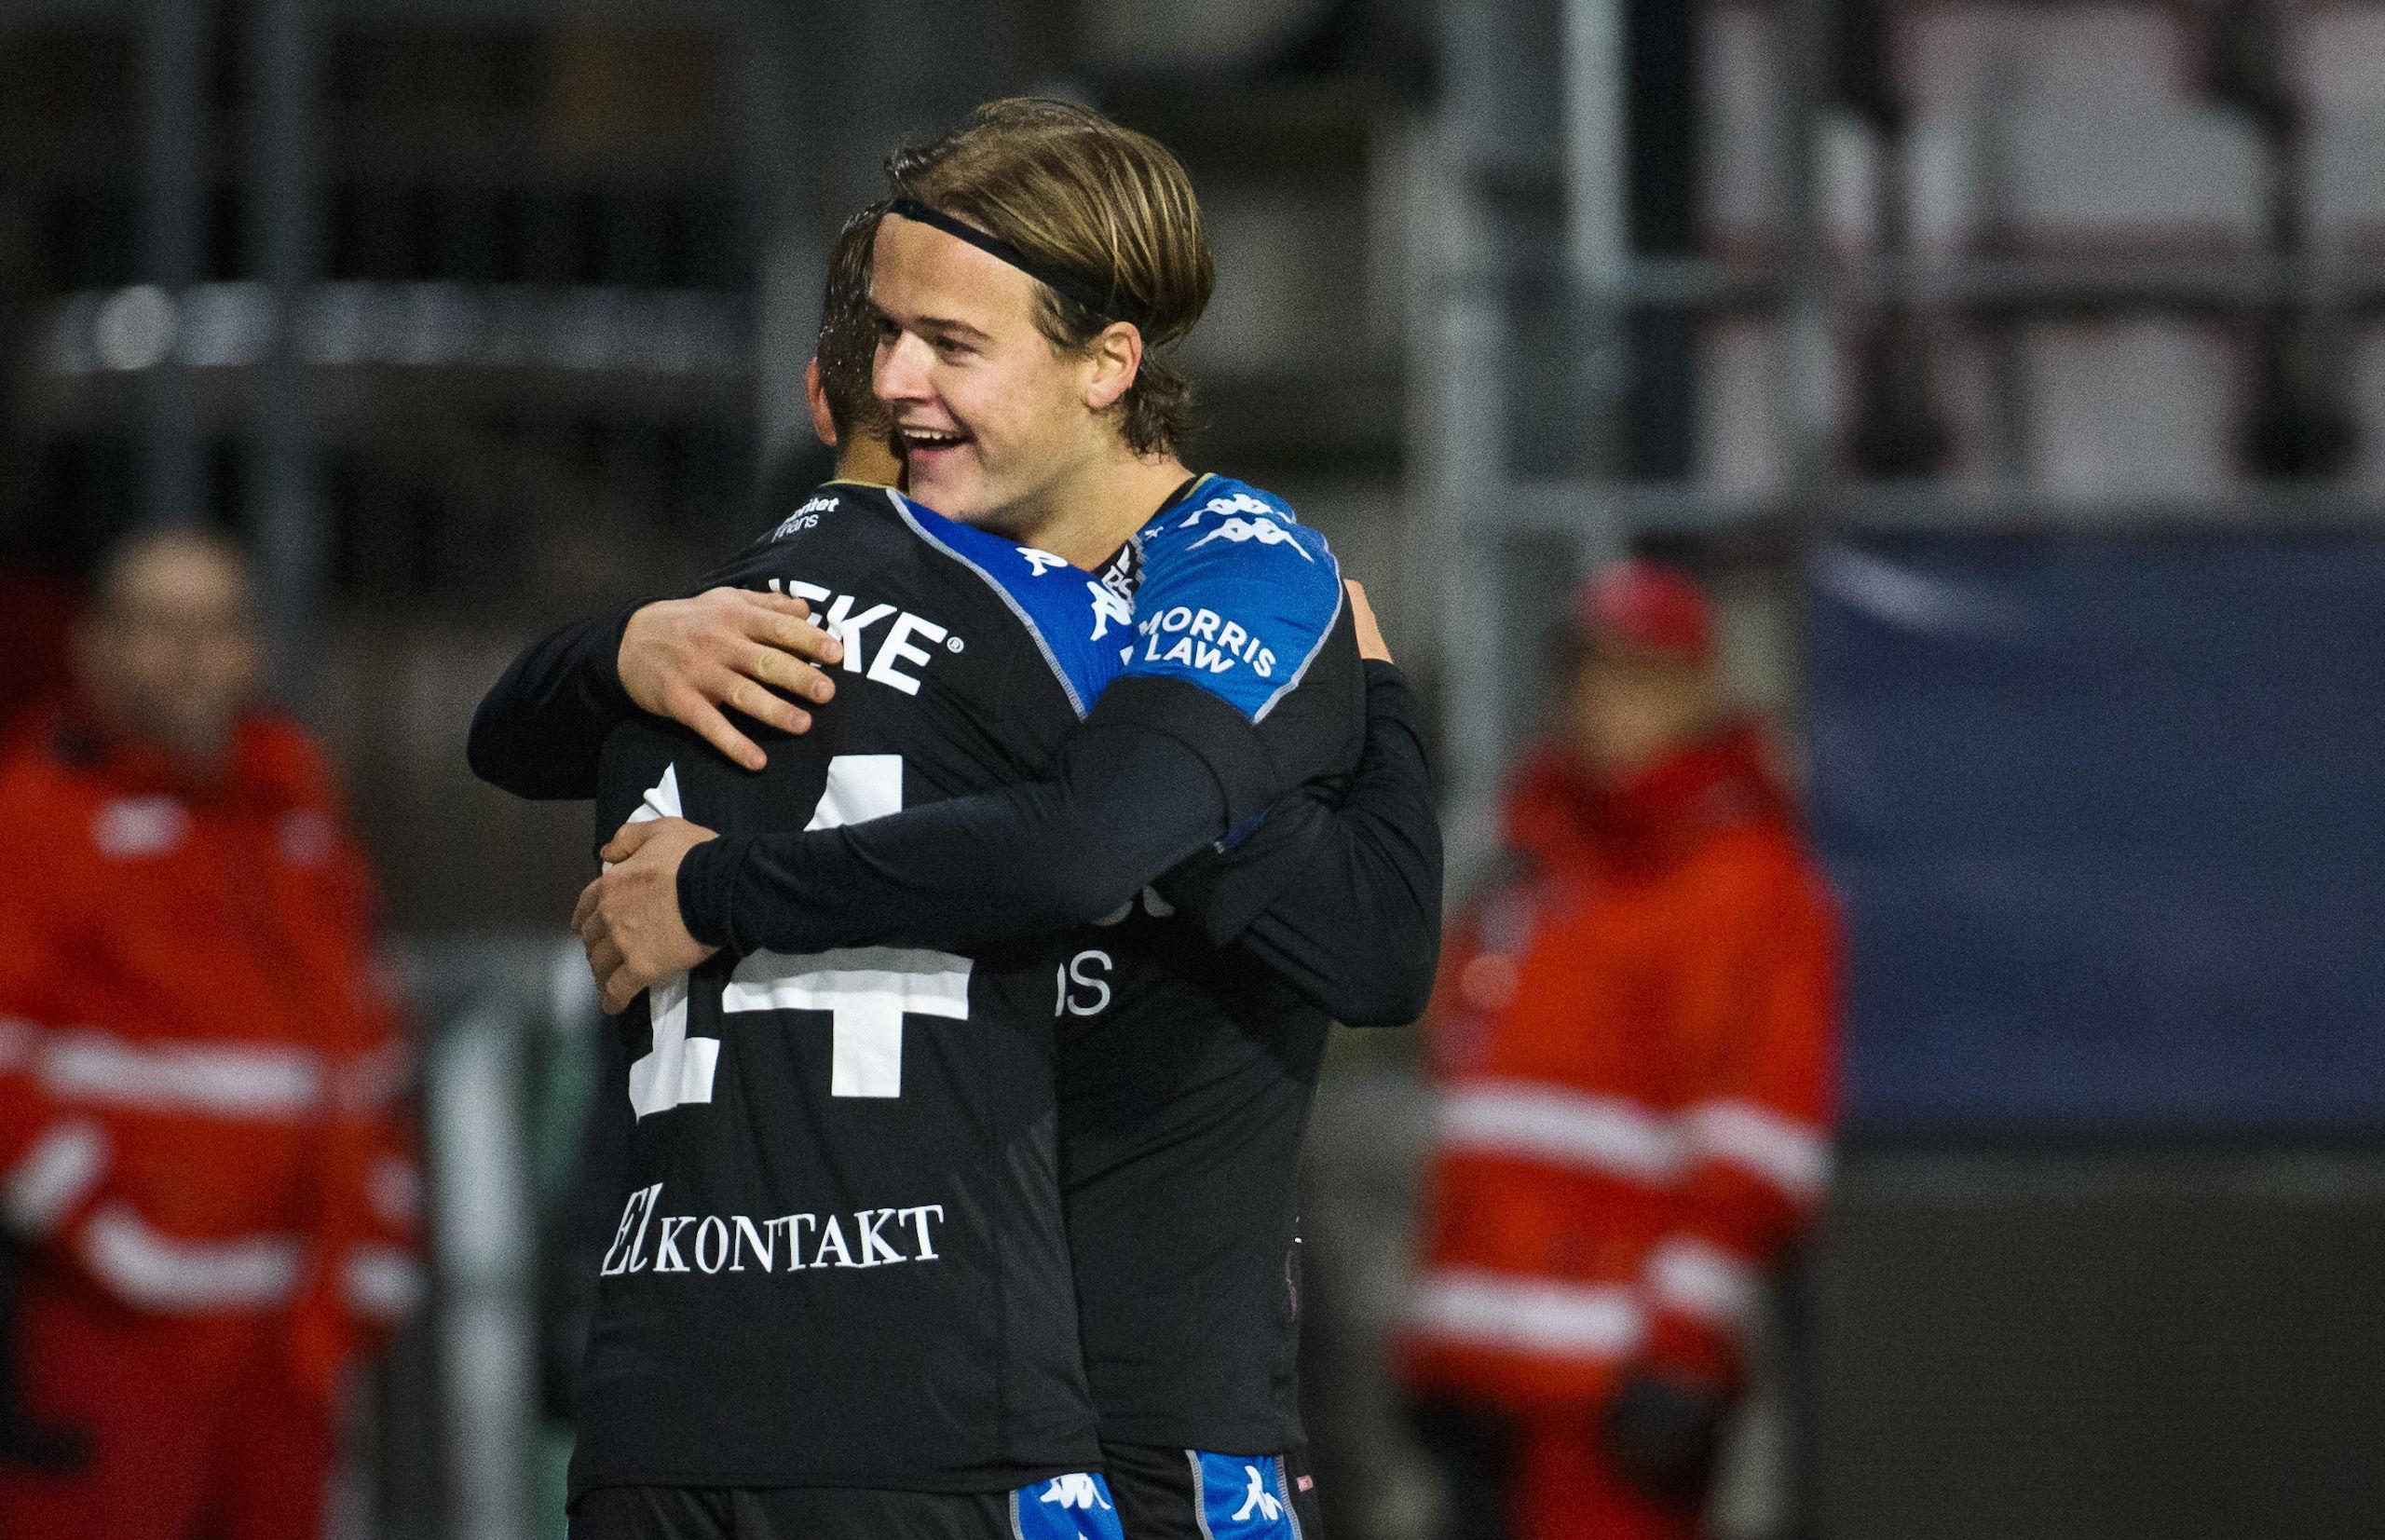 IFK Göteborgs glädjebesked – räddade miljonbelopp